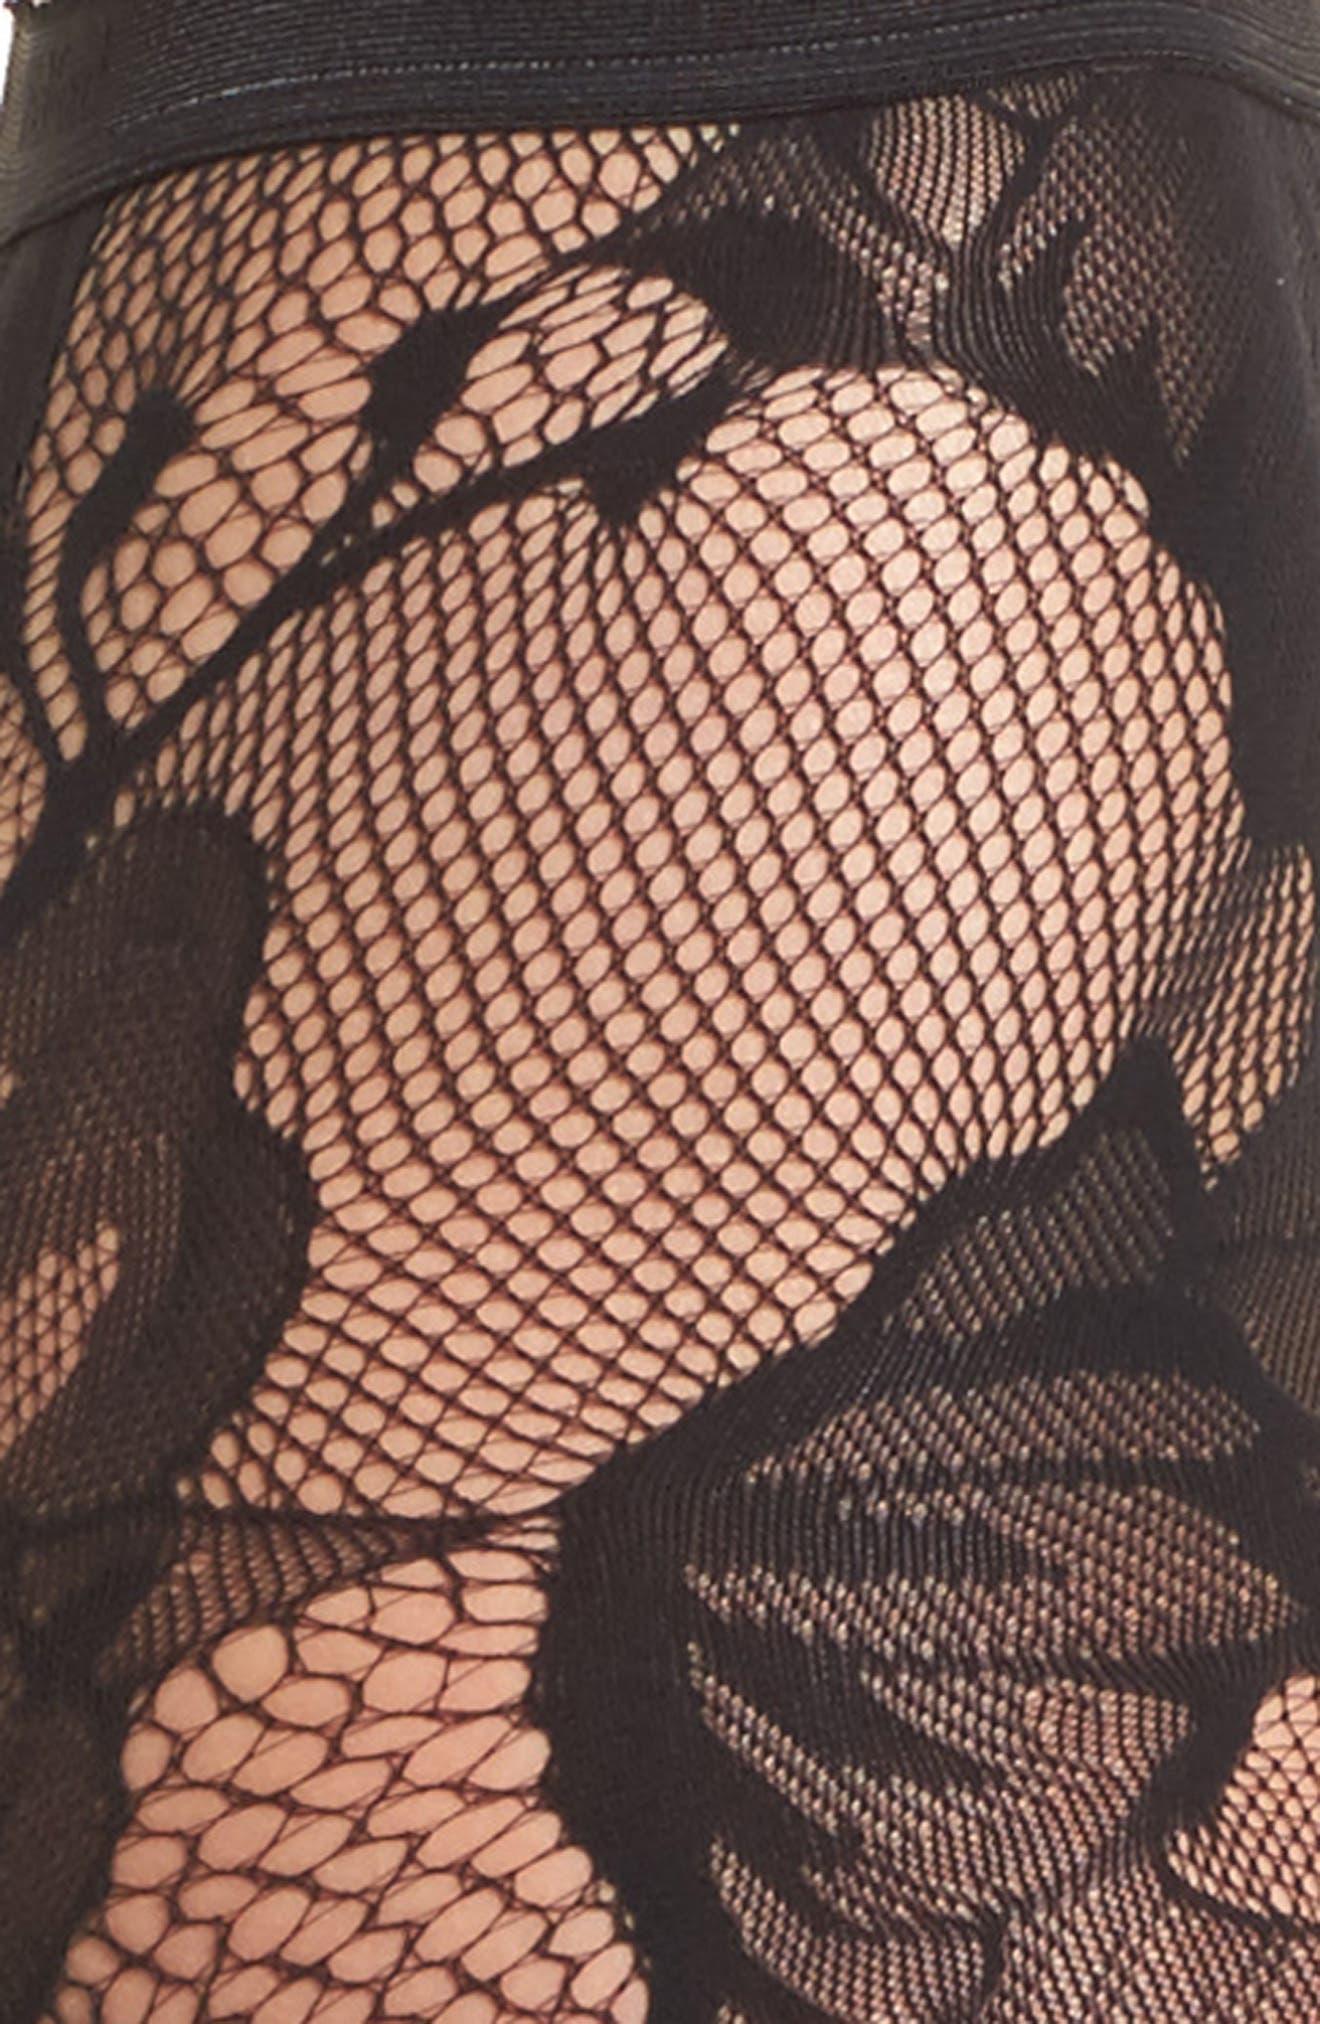 Pat Floral Lace Tights,                             Alternate thumbnail 2, color,                             Black